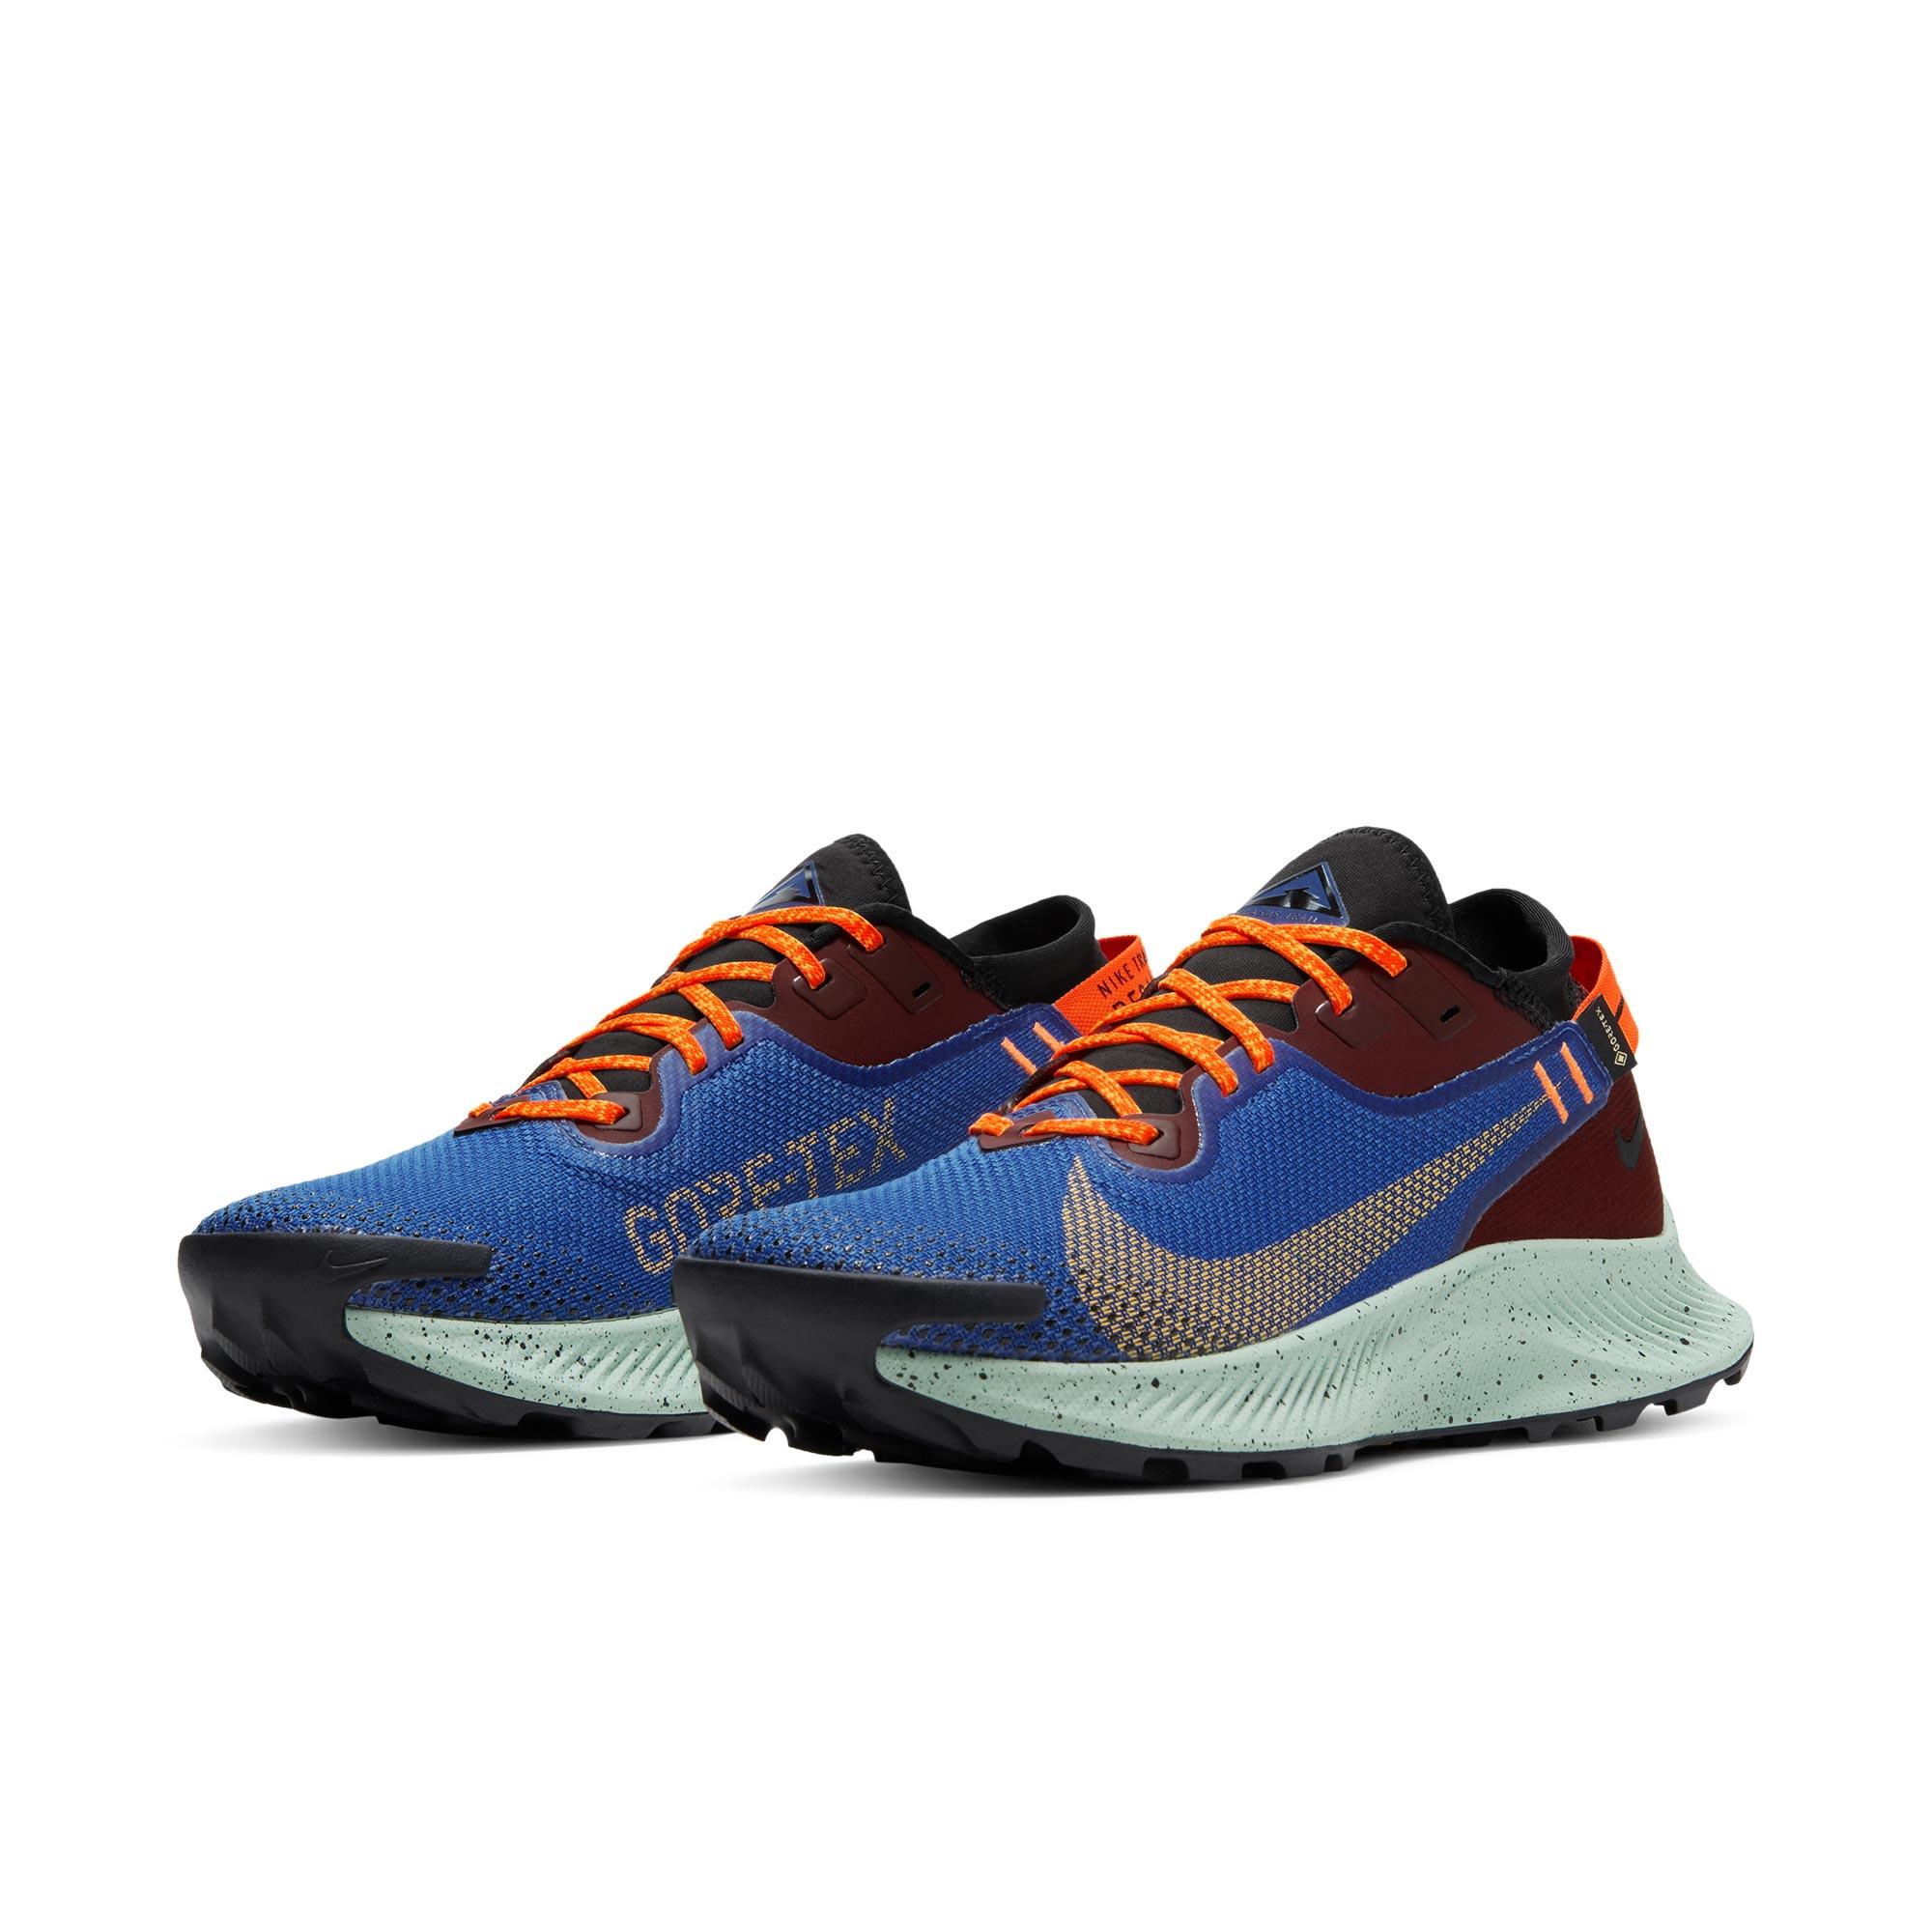 Nike耐克官方PEGASUS TRAIL 2 GTX 女子跑步鞋运动鞋越野跑CU2018